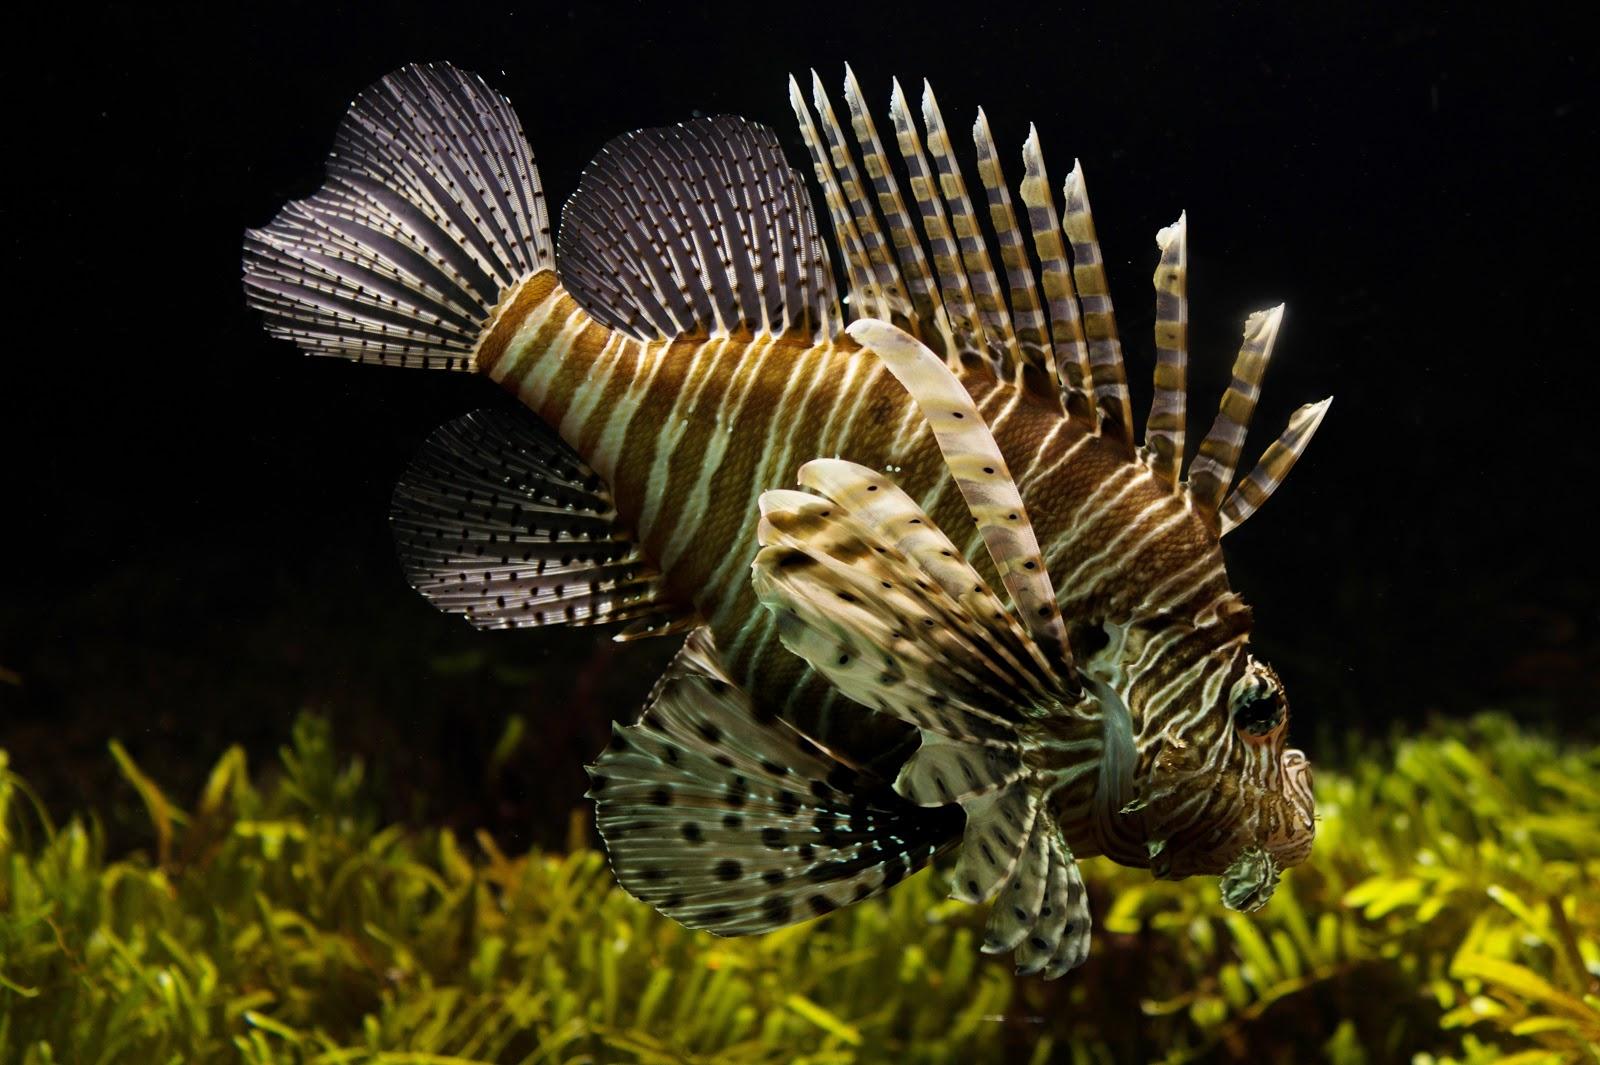 fish-fishtank-lionfish-animal-pictures